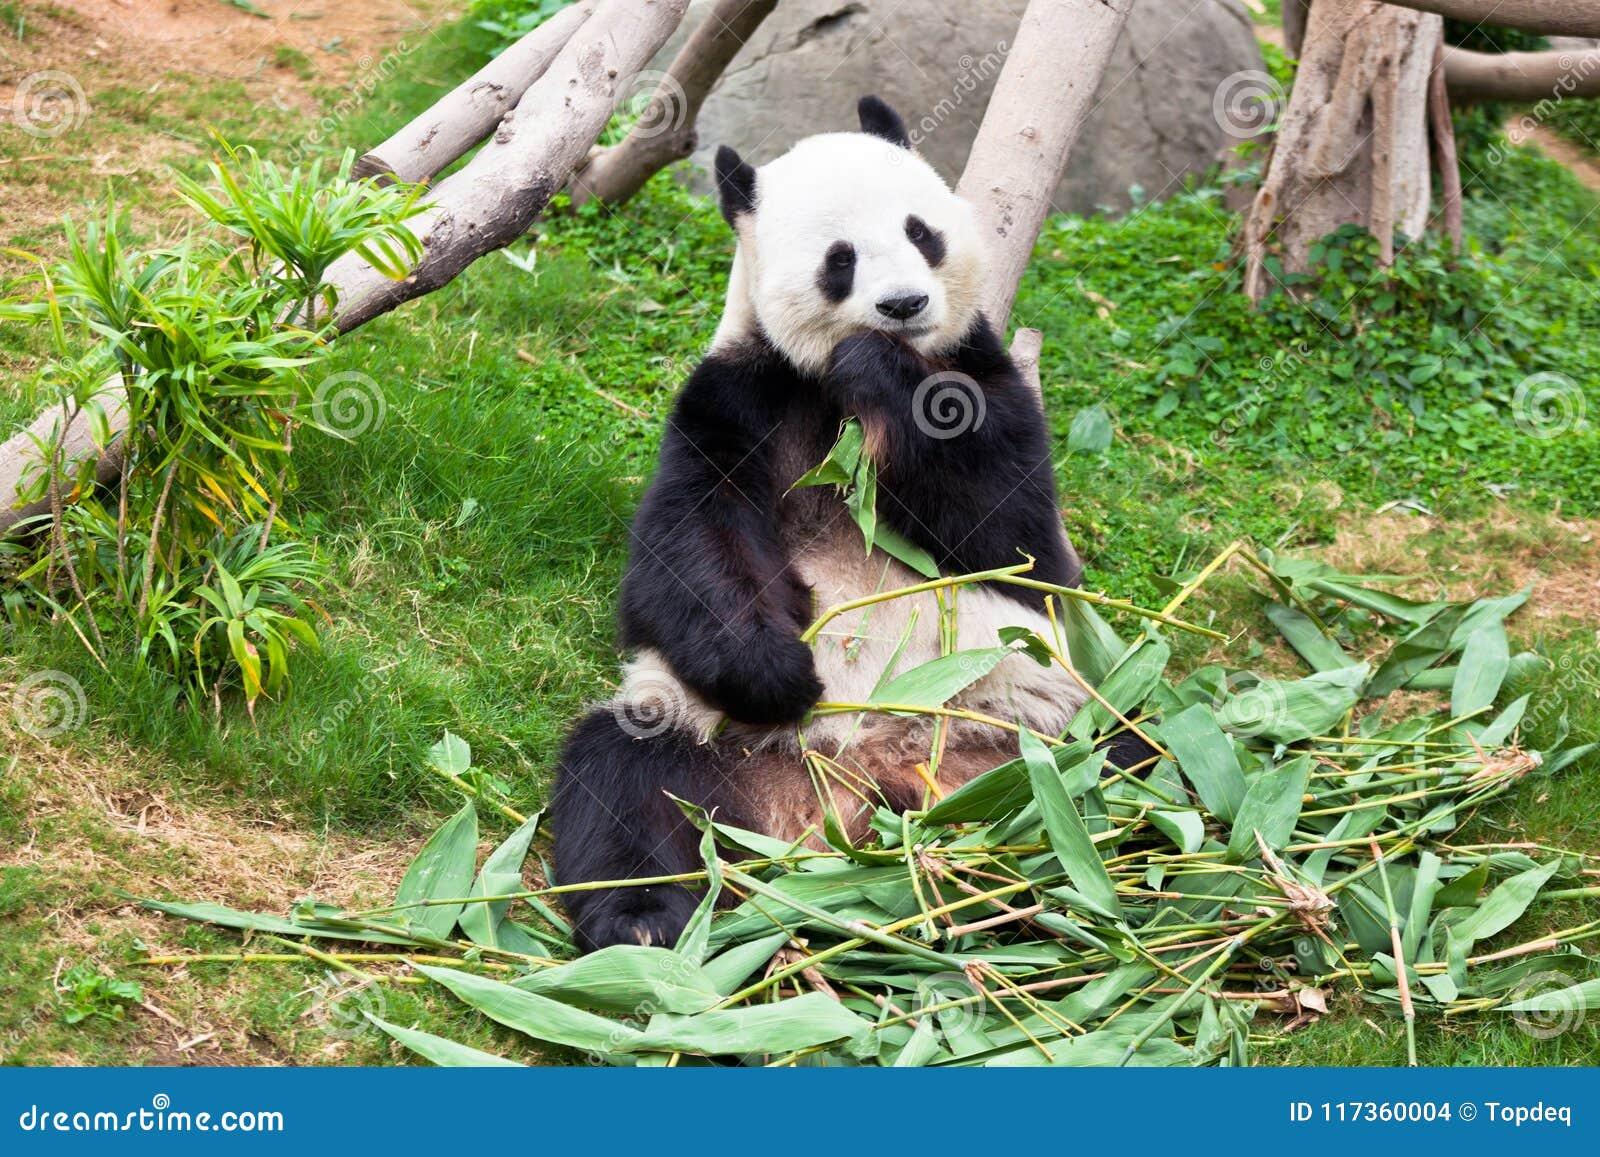 1 205 Lazy Panda Photos Free Royalty Free Stock Photos From Dreamstime